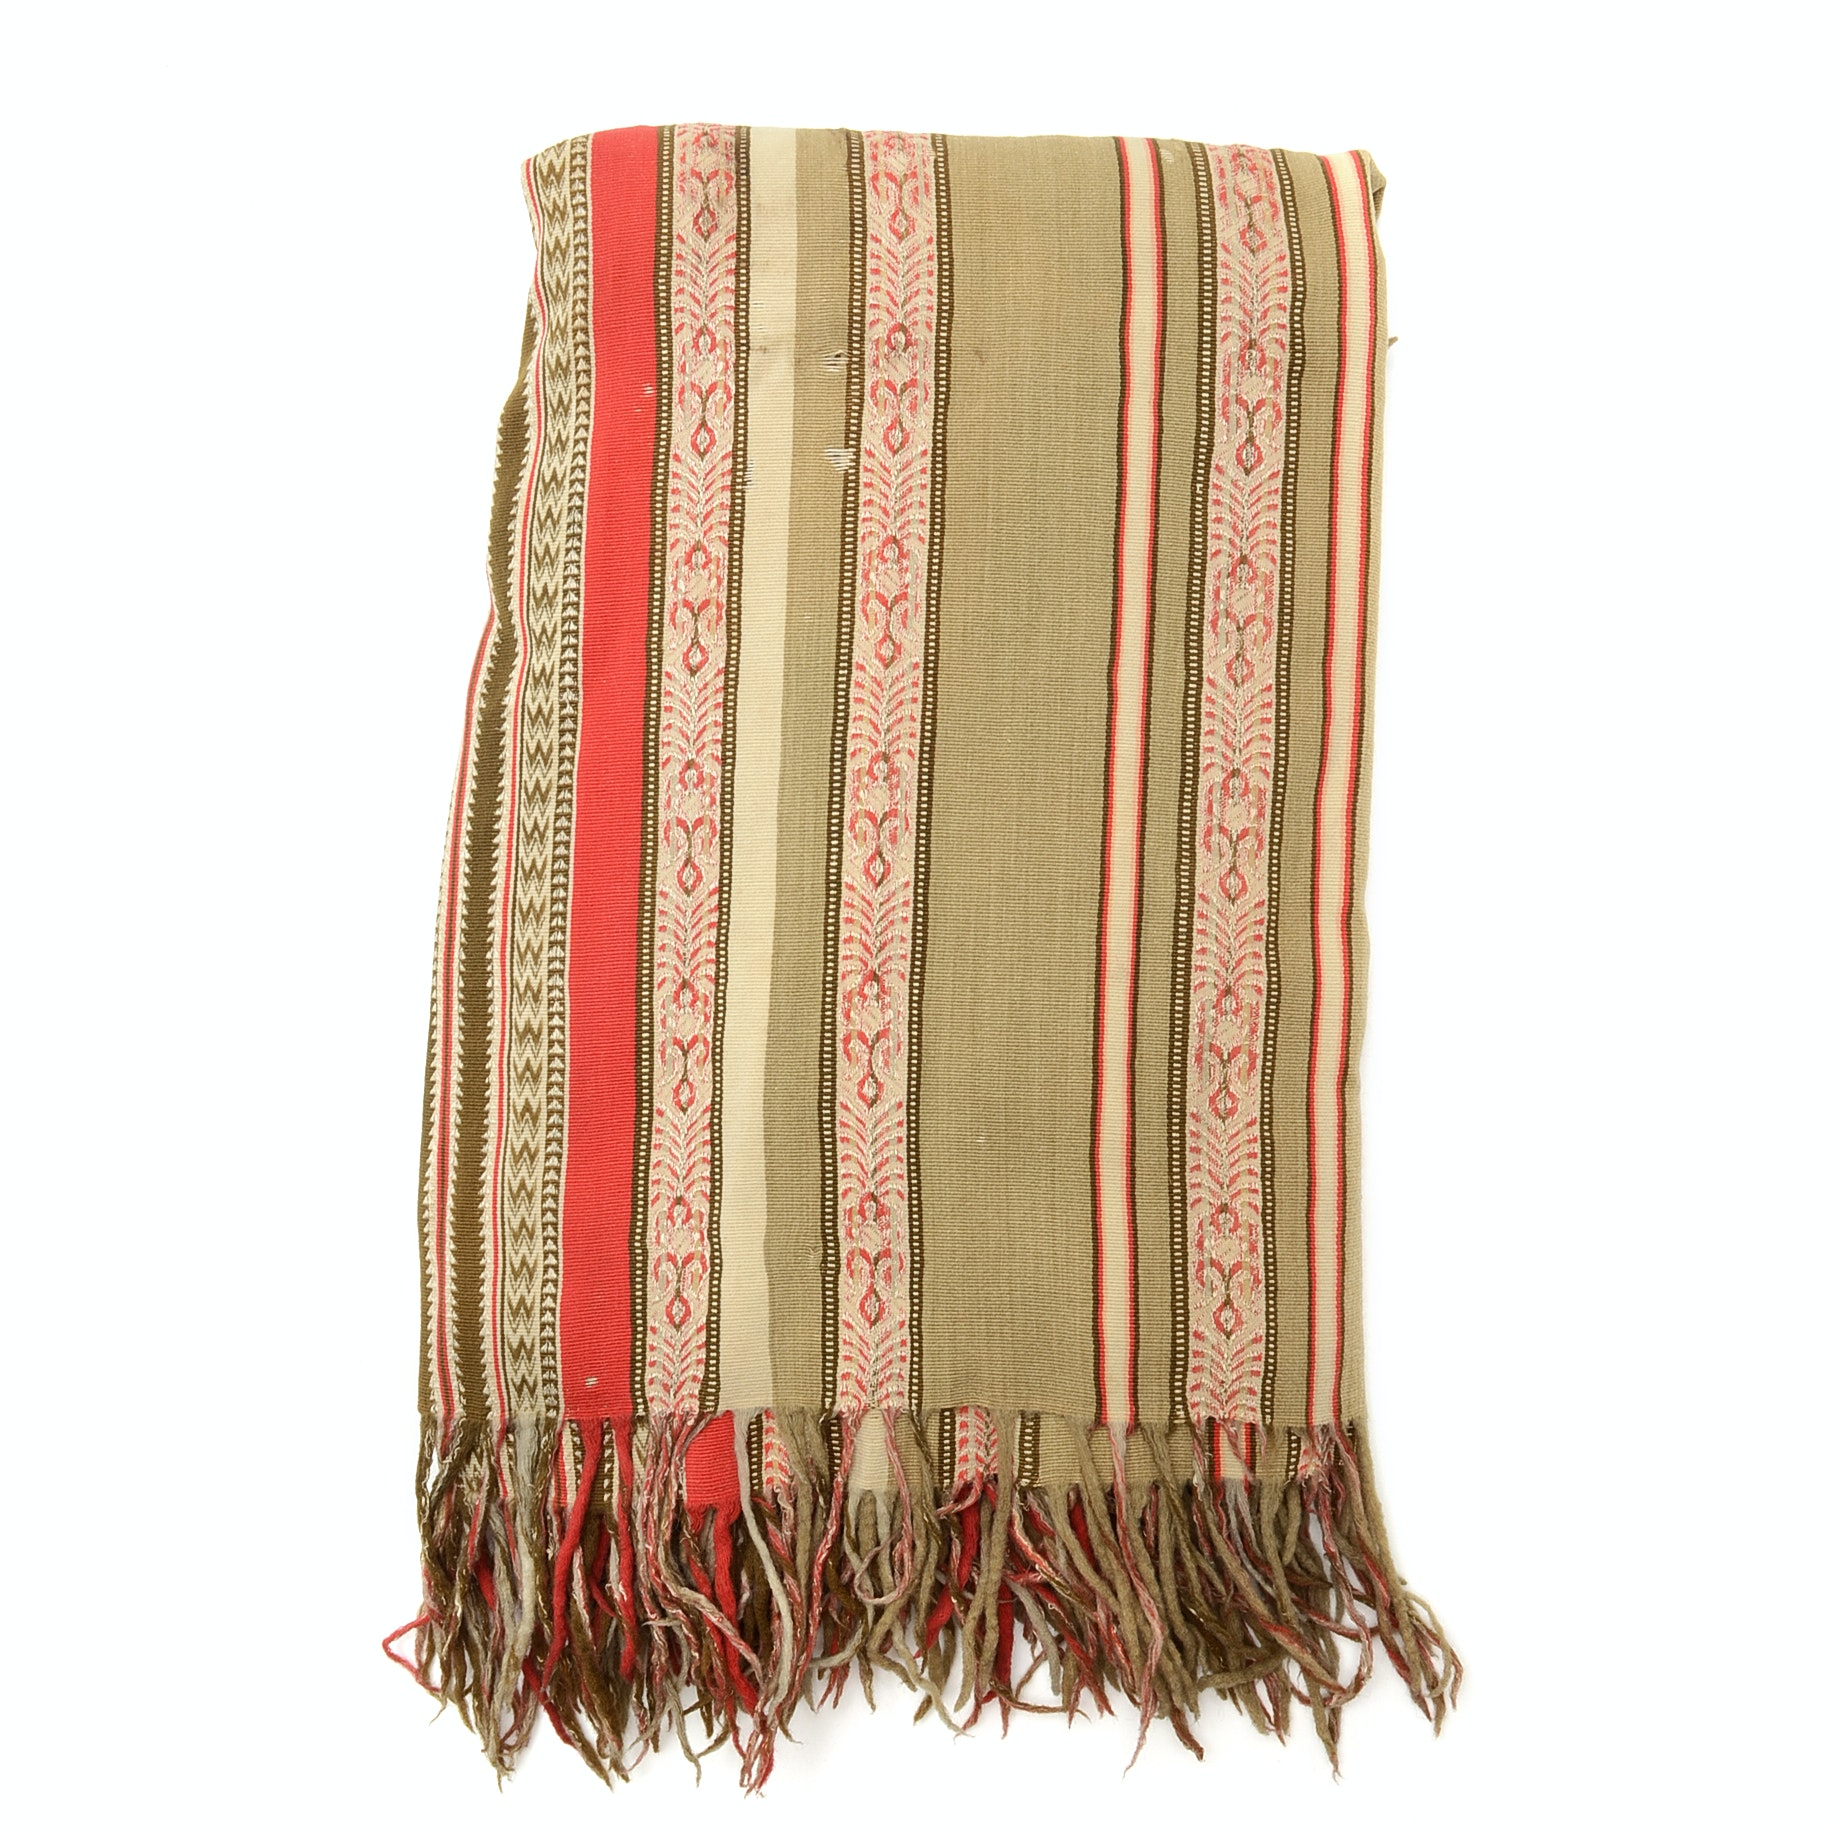 Woven Wool Blend Textile